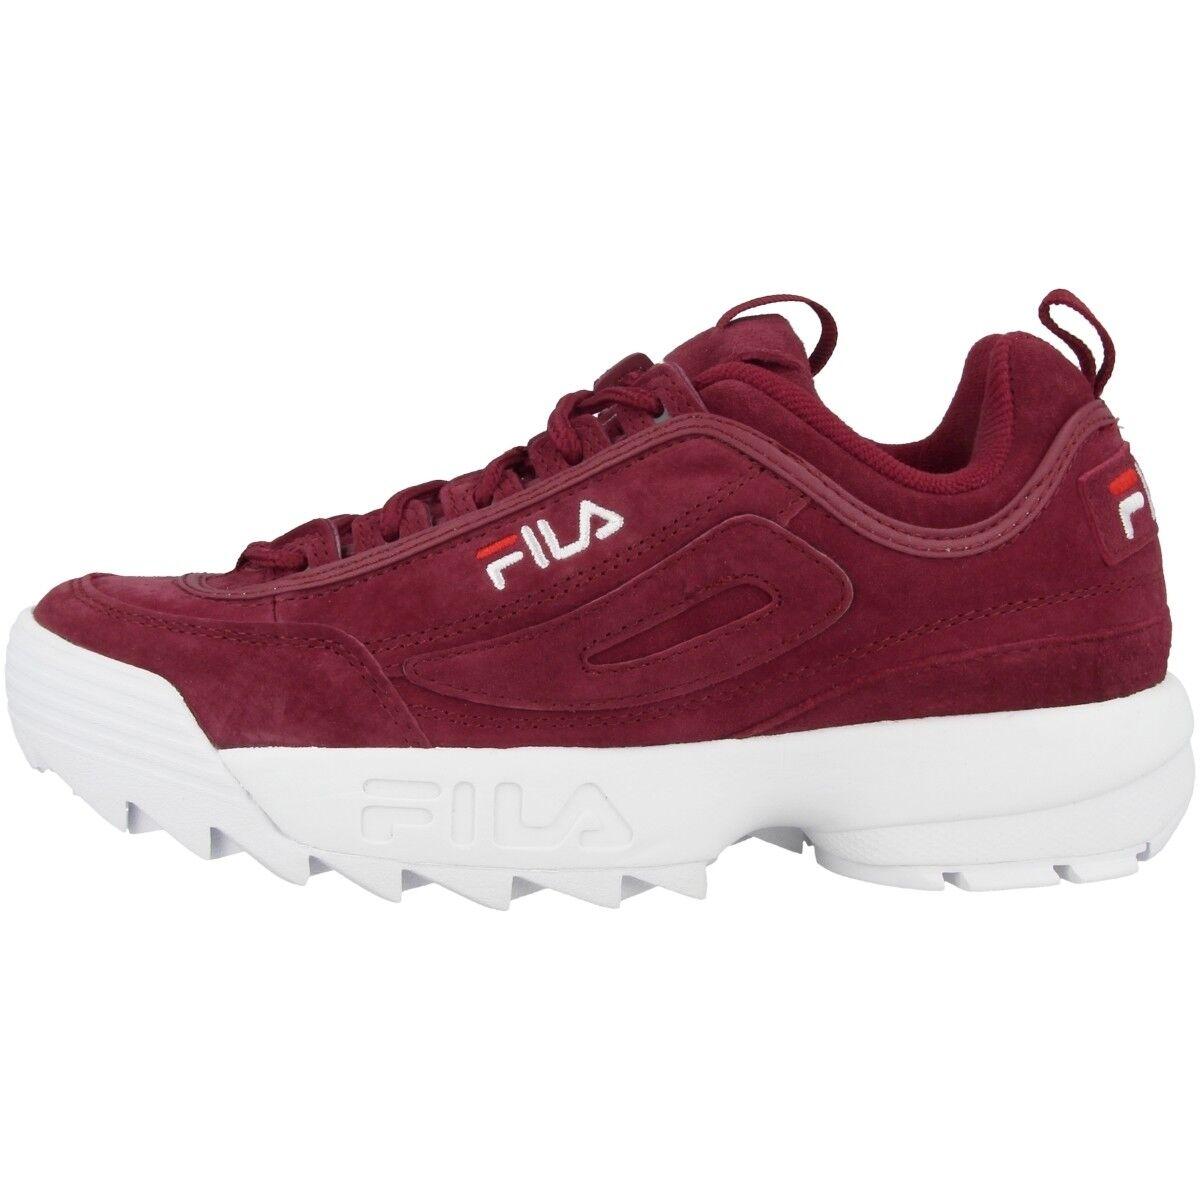 Fila Disruptor S LOW shoes Women Women's Casual Trainers Low shoes 1010553.40K